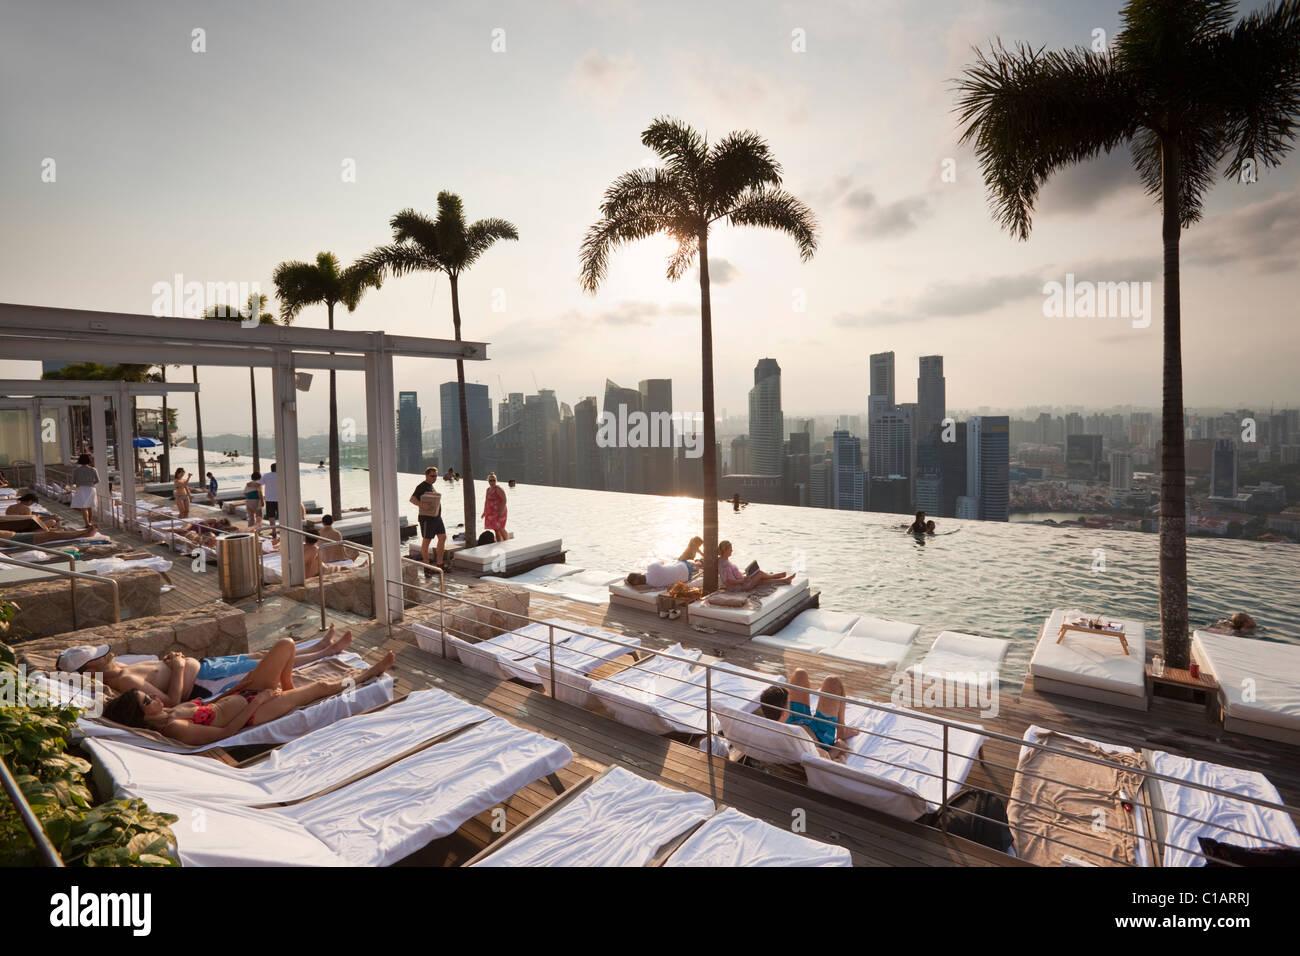 Swimming pool at the Marina Bay Sands SkyPark.  Marina Bay, Singapore - Stock Image